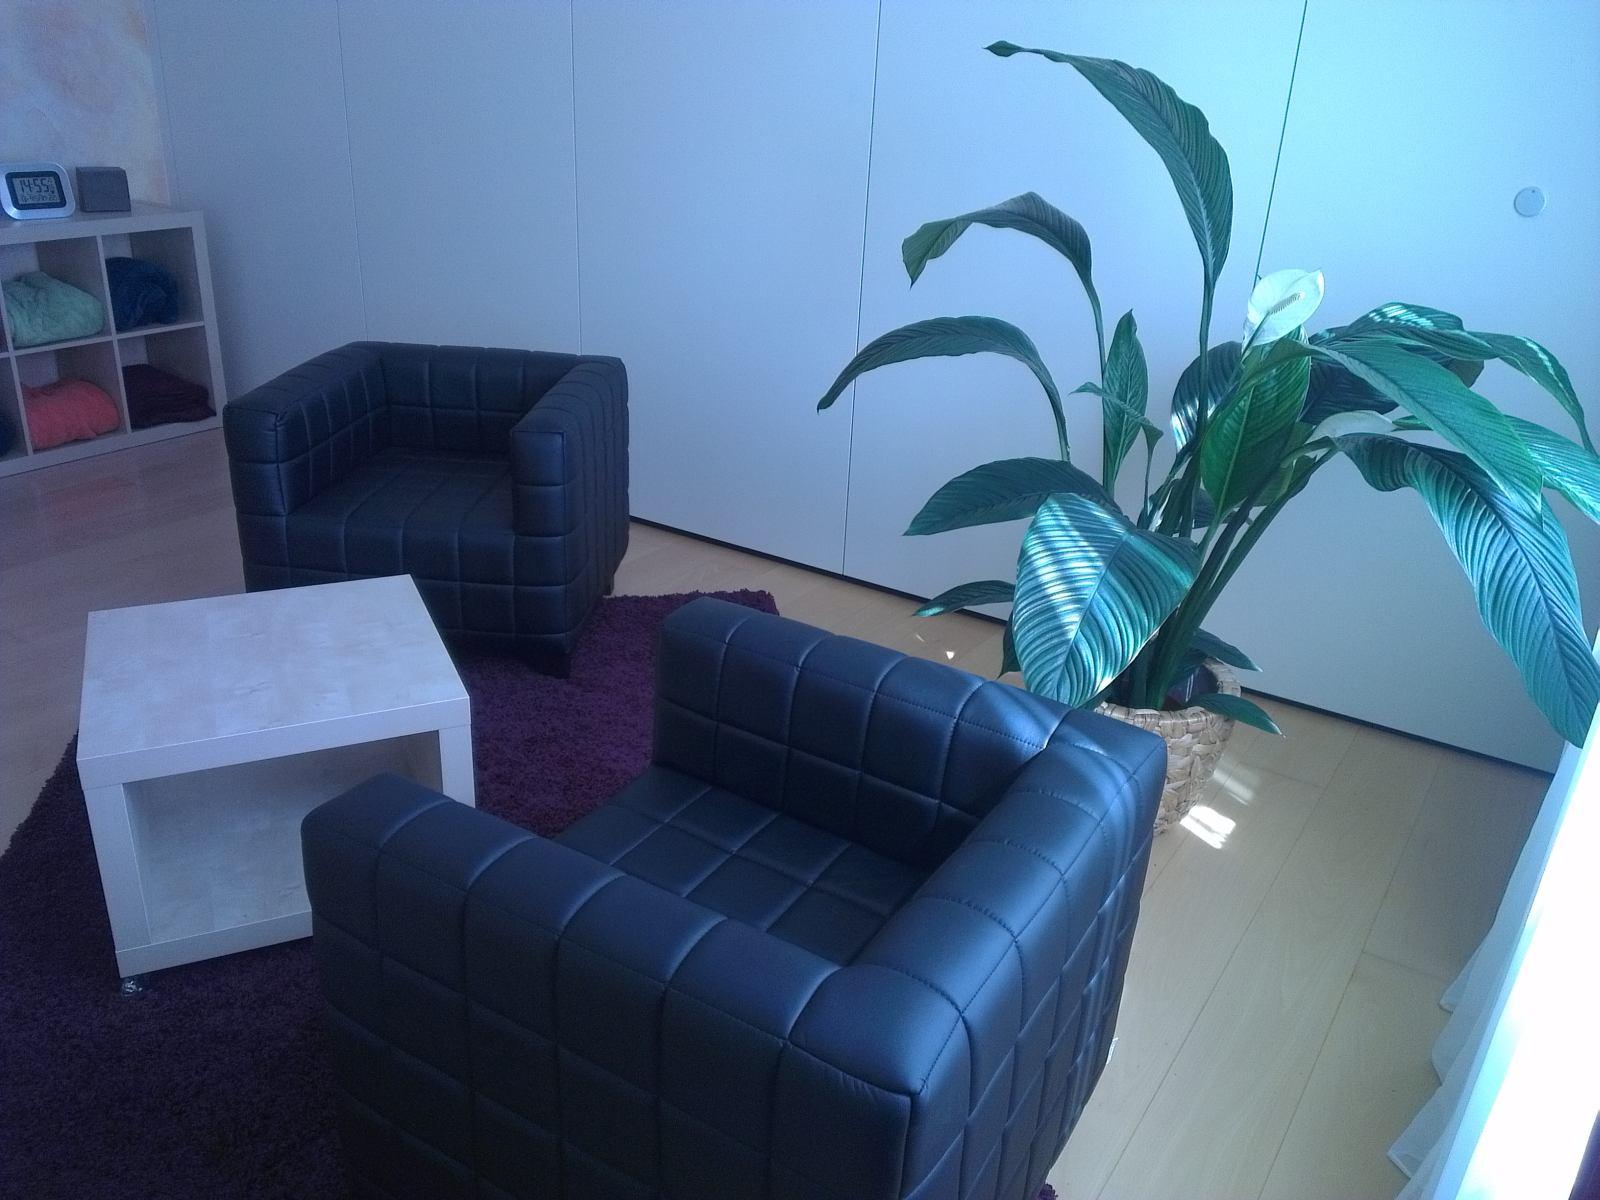 Wandelplatz Büroraum Praxisraum